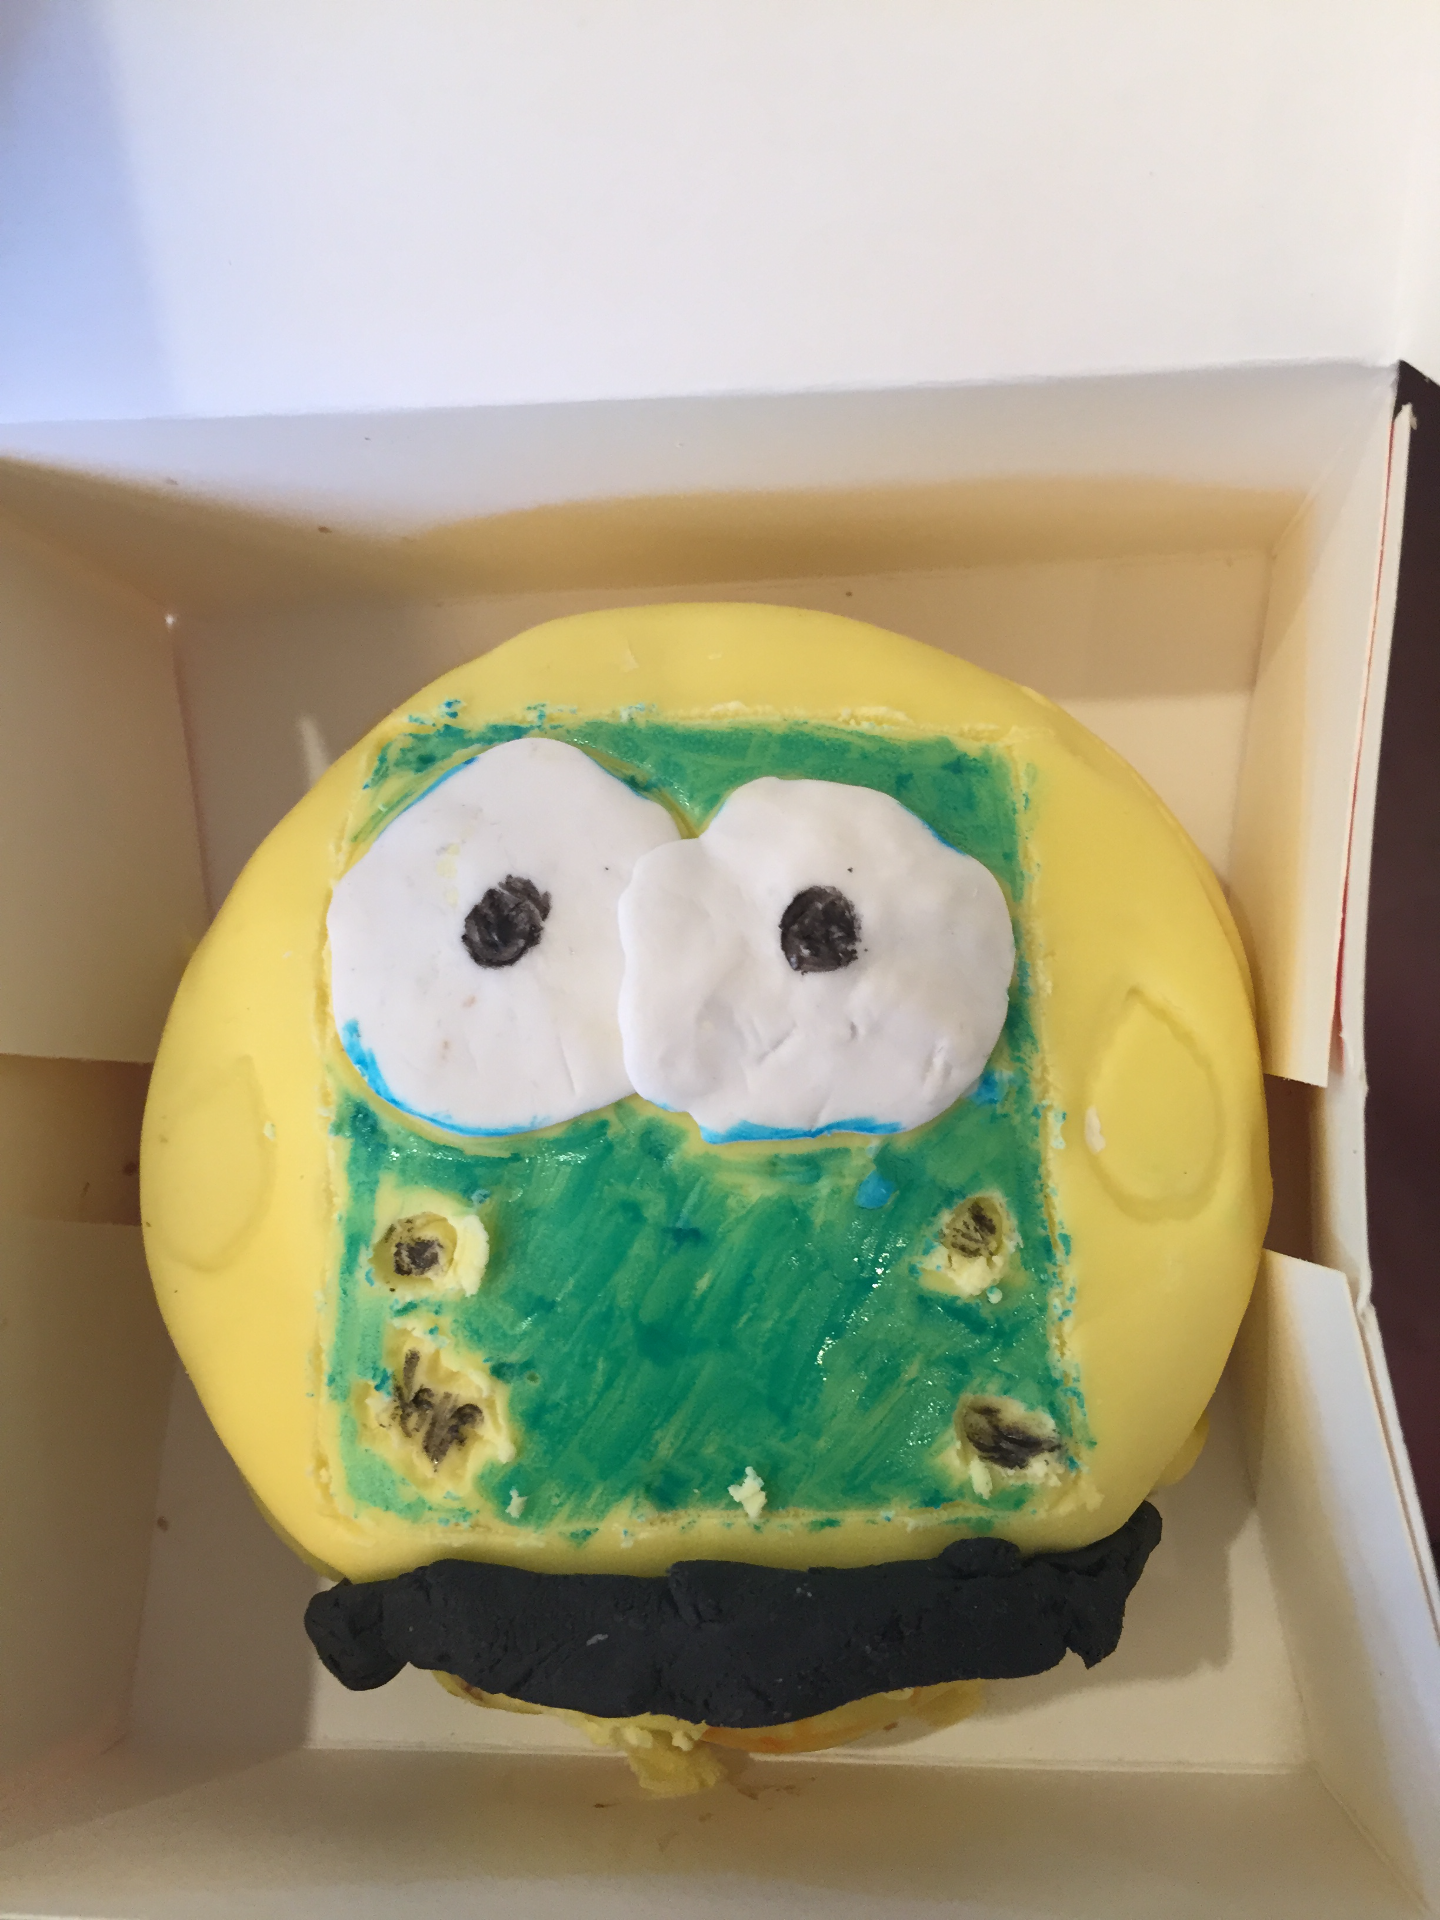 Atelier Cake Design 11 octobre 2015